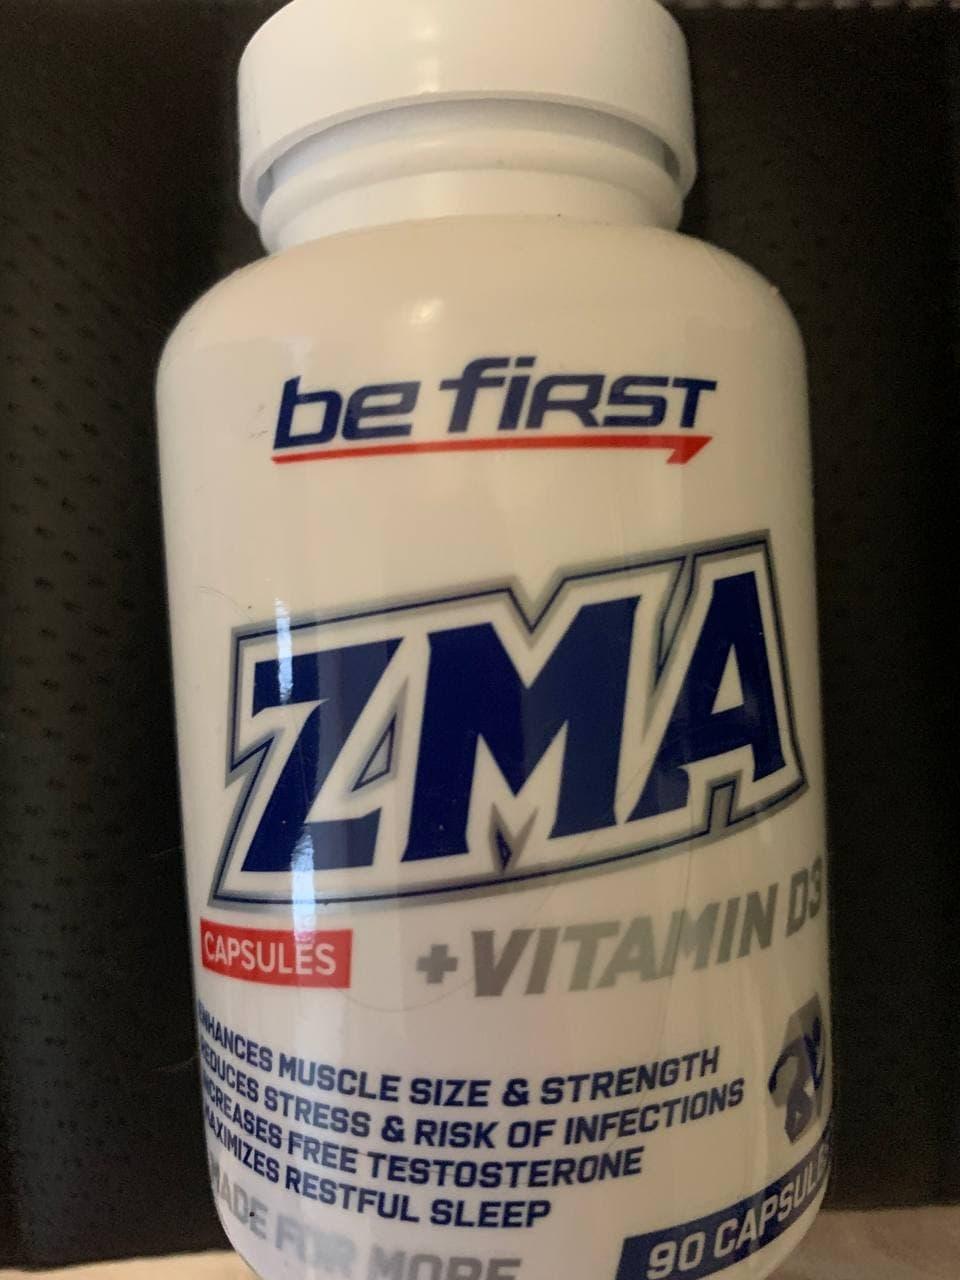 Be First ZMA + vitamin D3, 90 капсул - Спортсмену нужная добавка